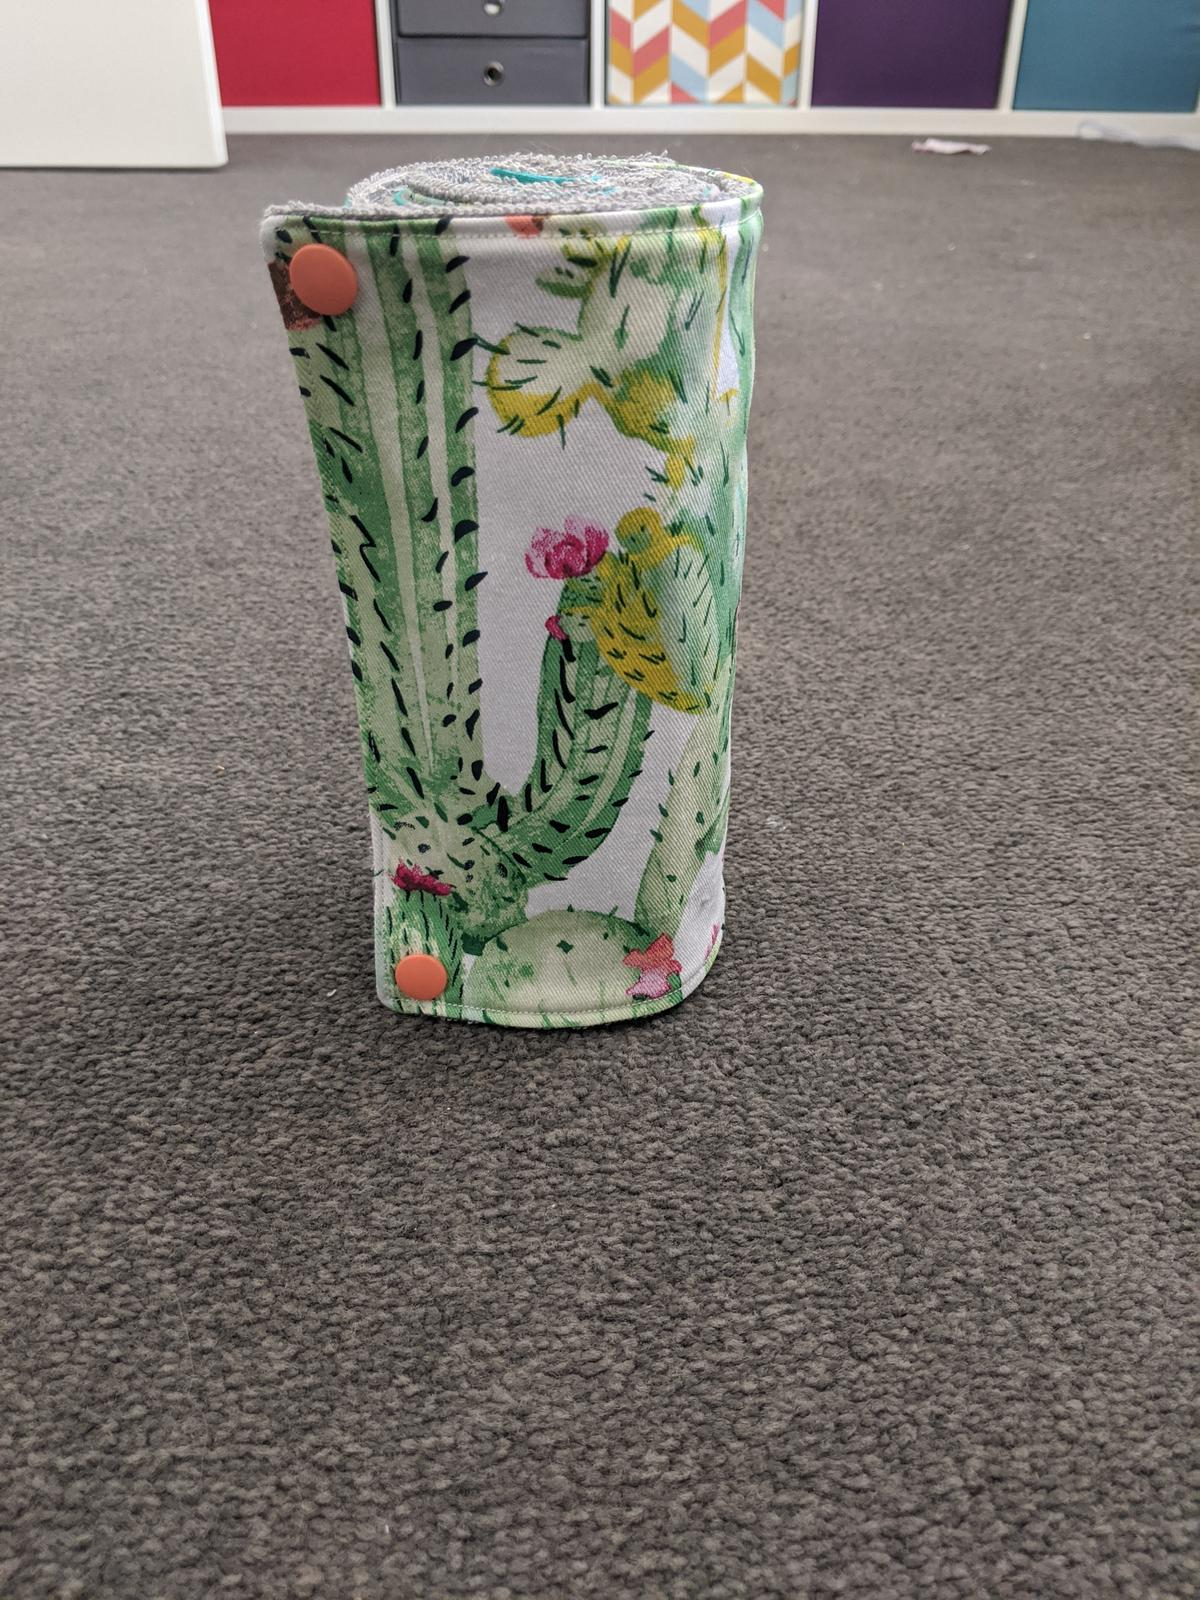 Cactus Reusable Paper towels